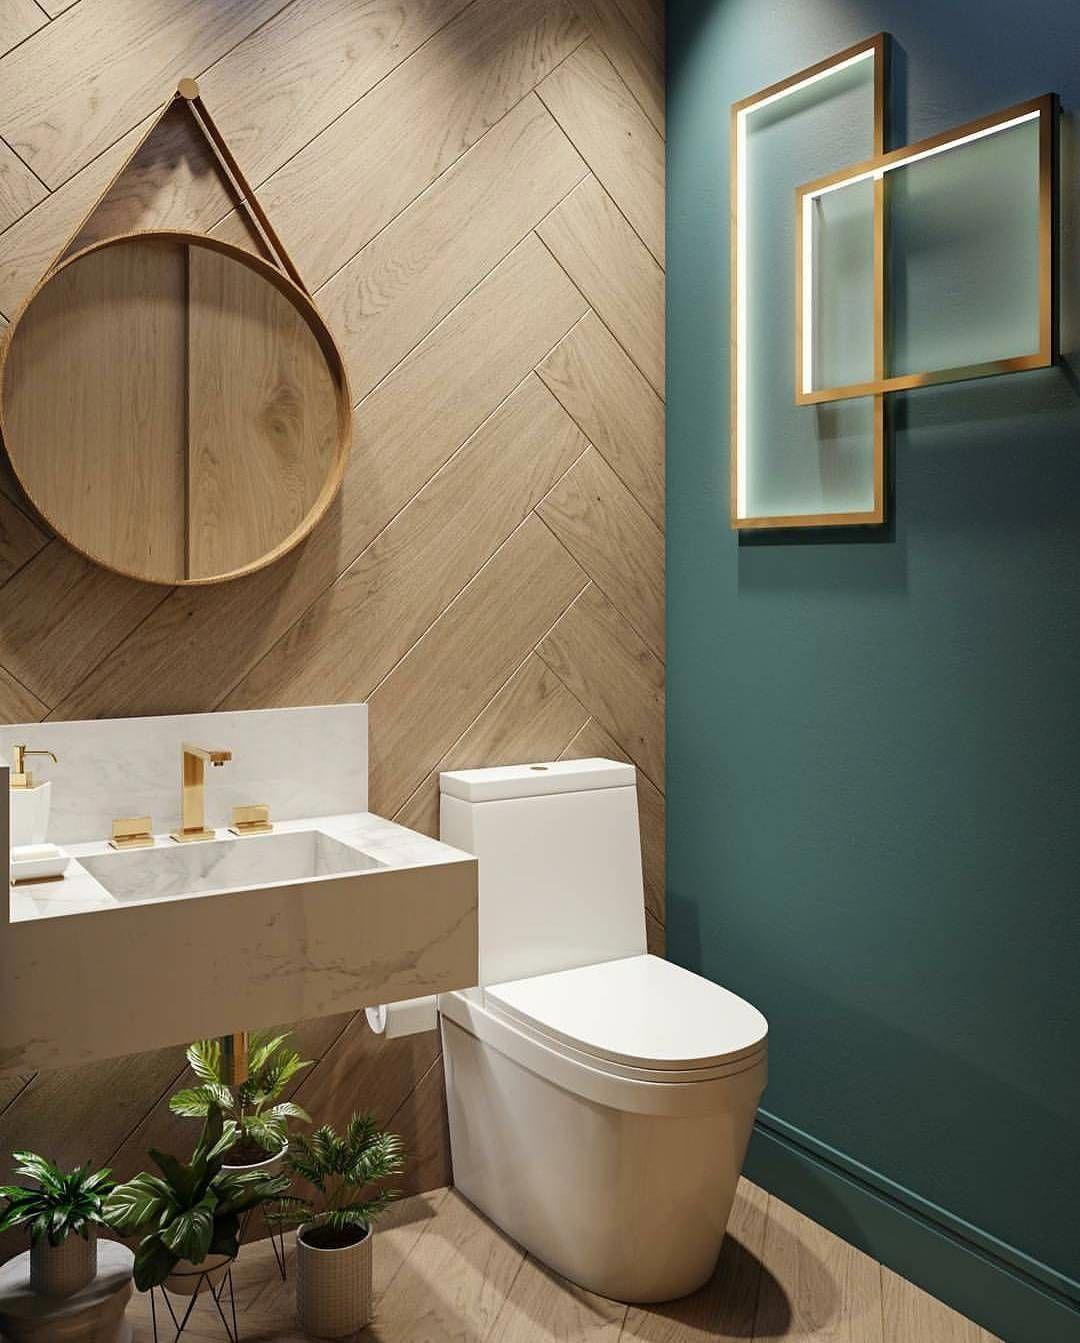 10 Beautiful Breathtaking Powder Room Ideas Avionale Design Bathroom Inspiration Decor Bathroom Design Decor Modern Powder Rooms